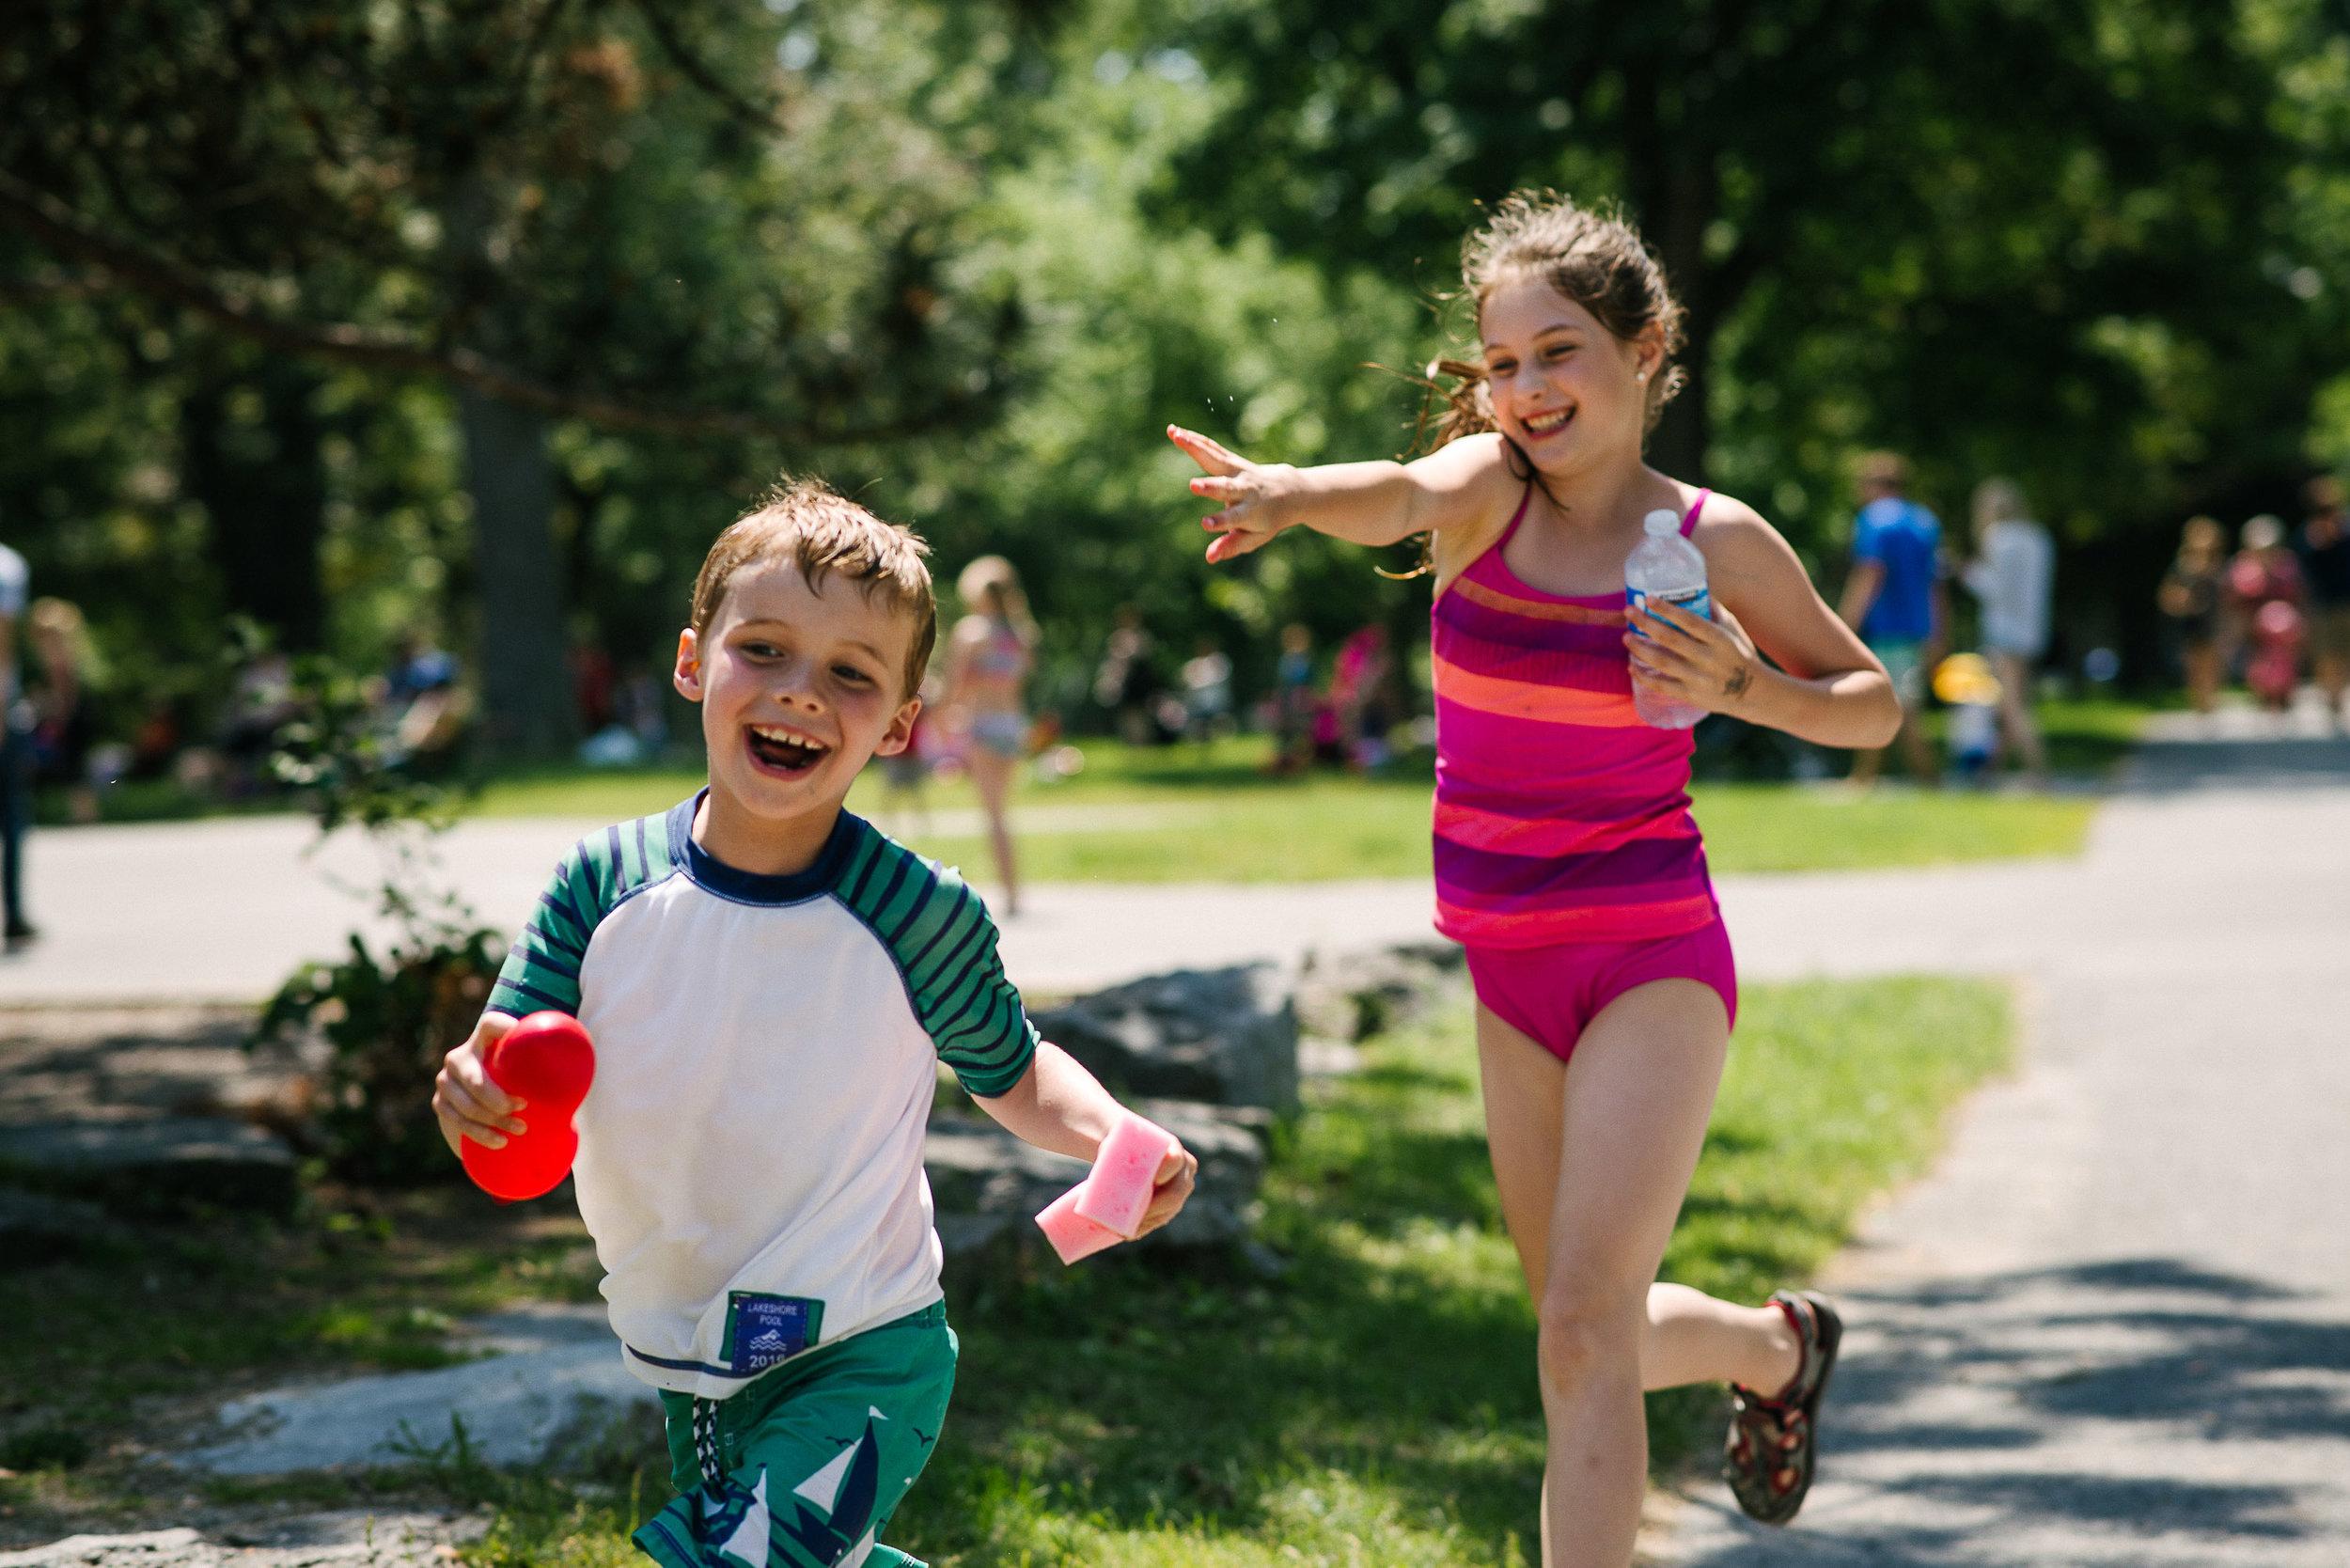 Murray going away party blog family photography viara mileva-142456vm.jpg